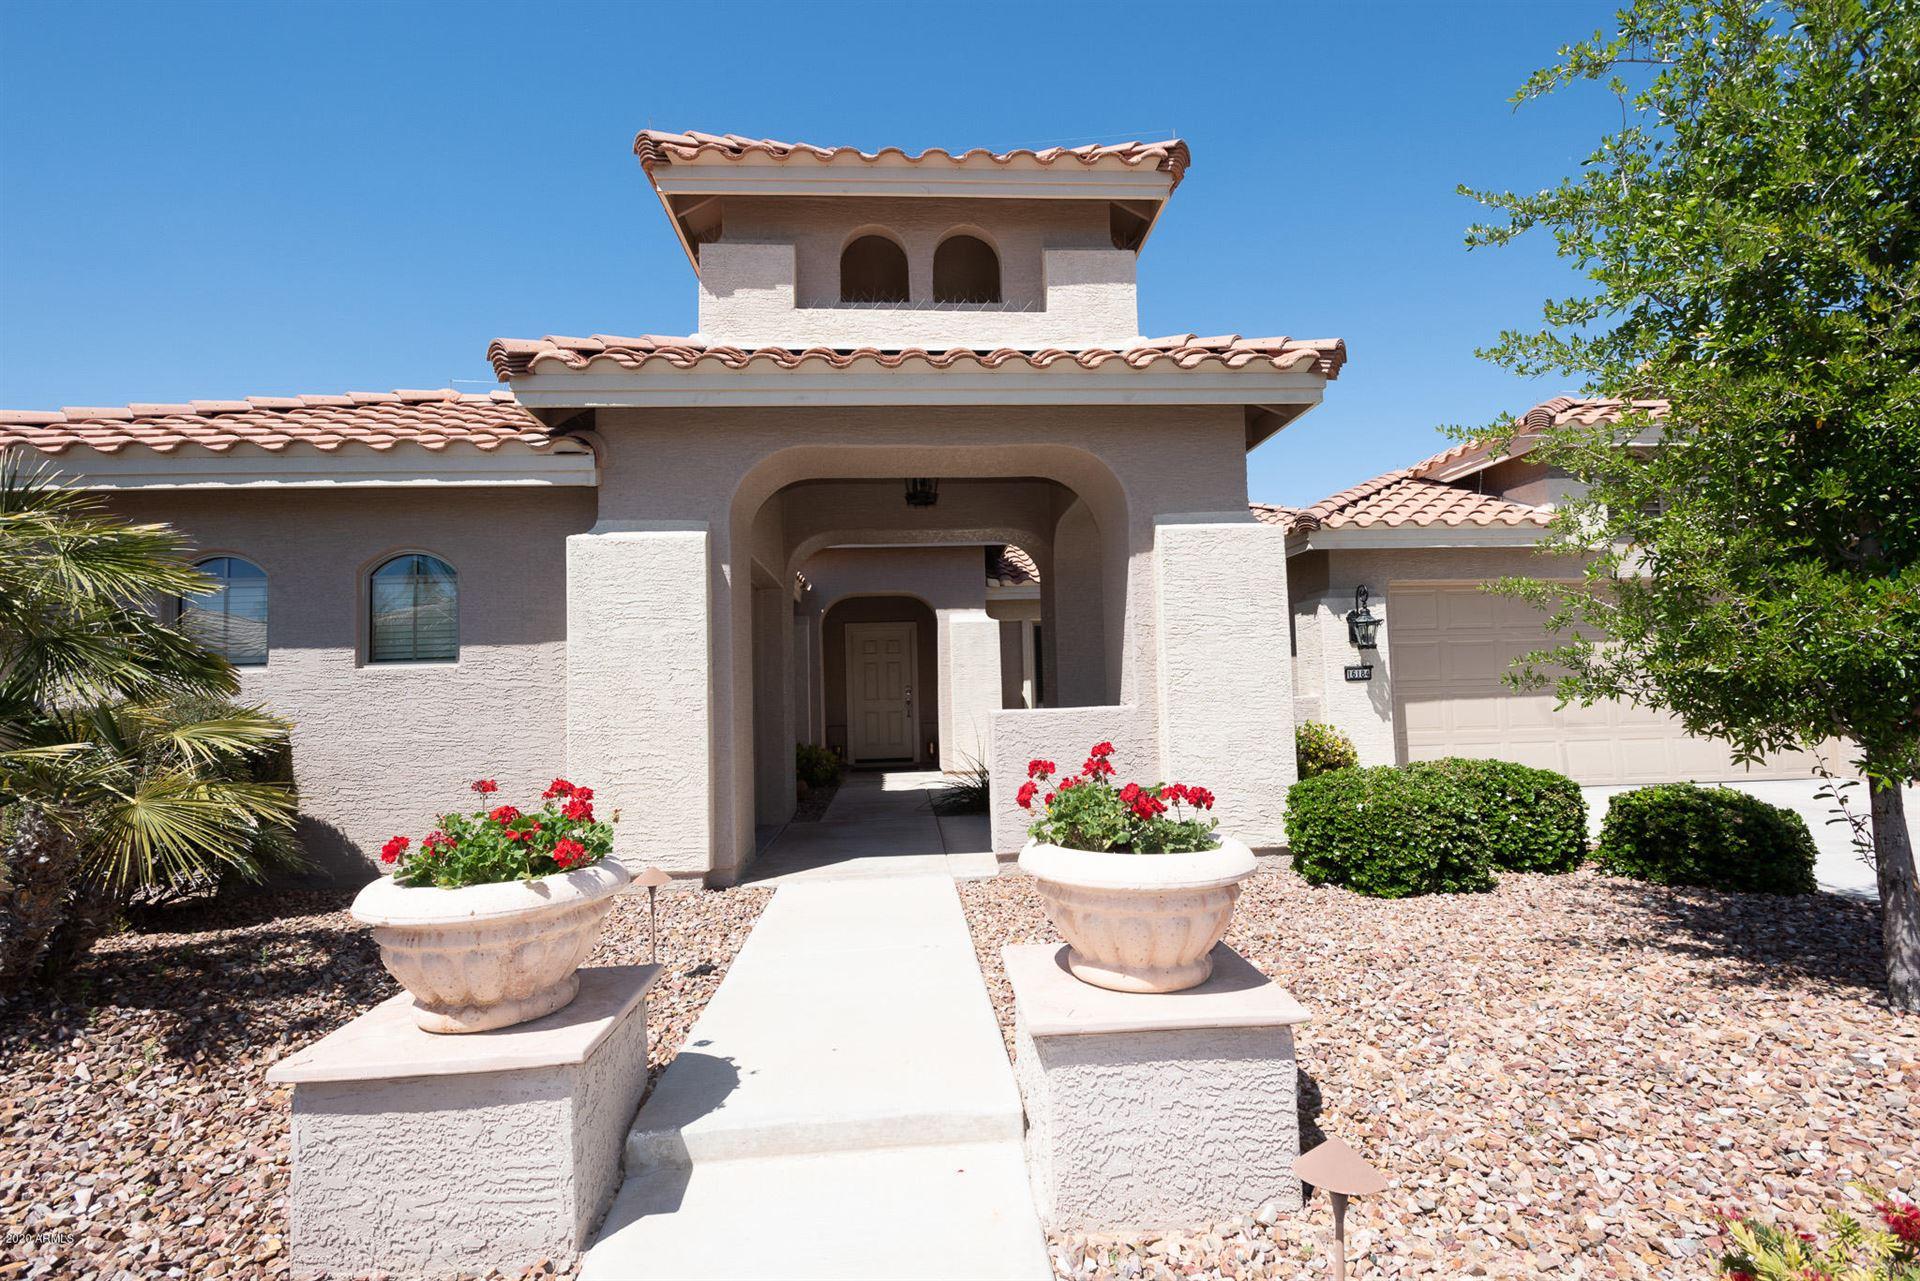 16184 W MULBERRY Drive, Goodyear, AZ 85395 - #: 6067419